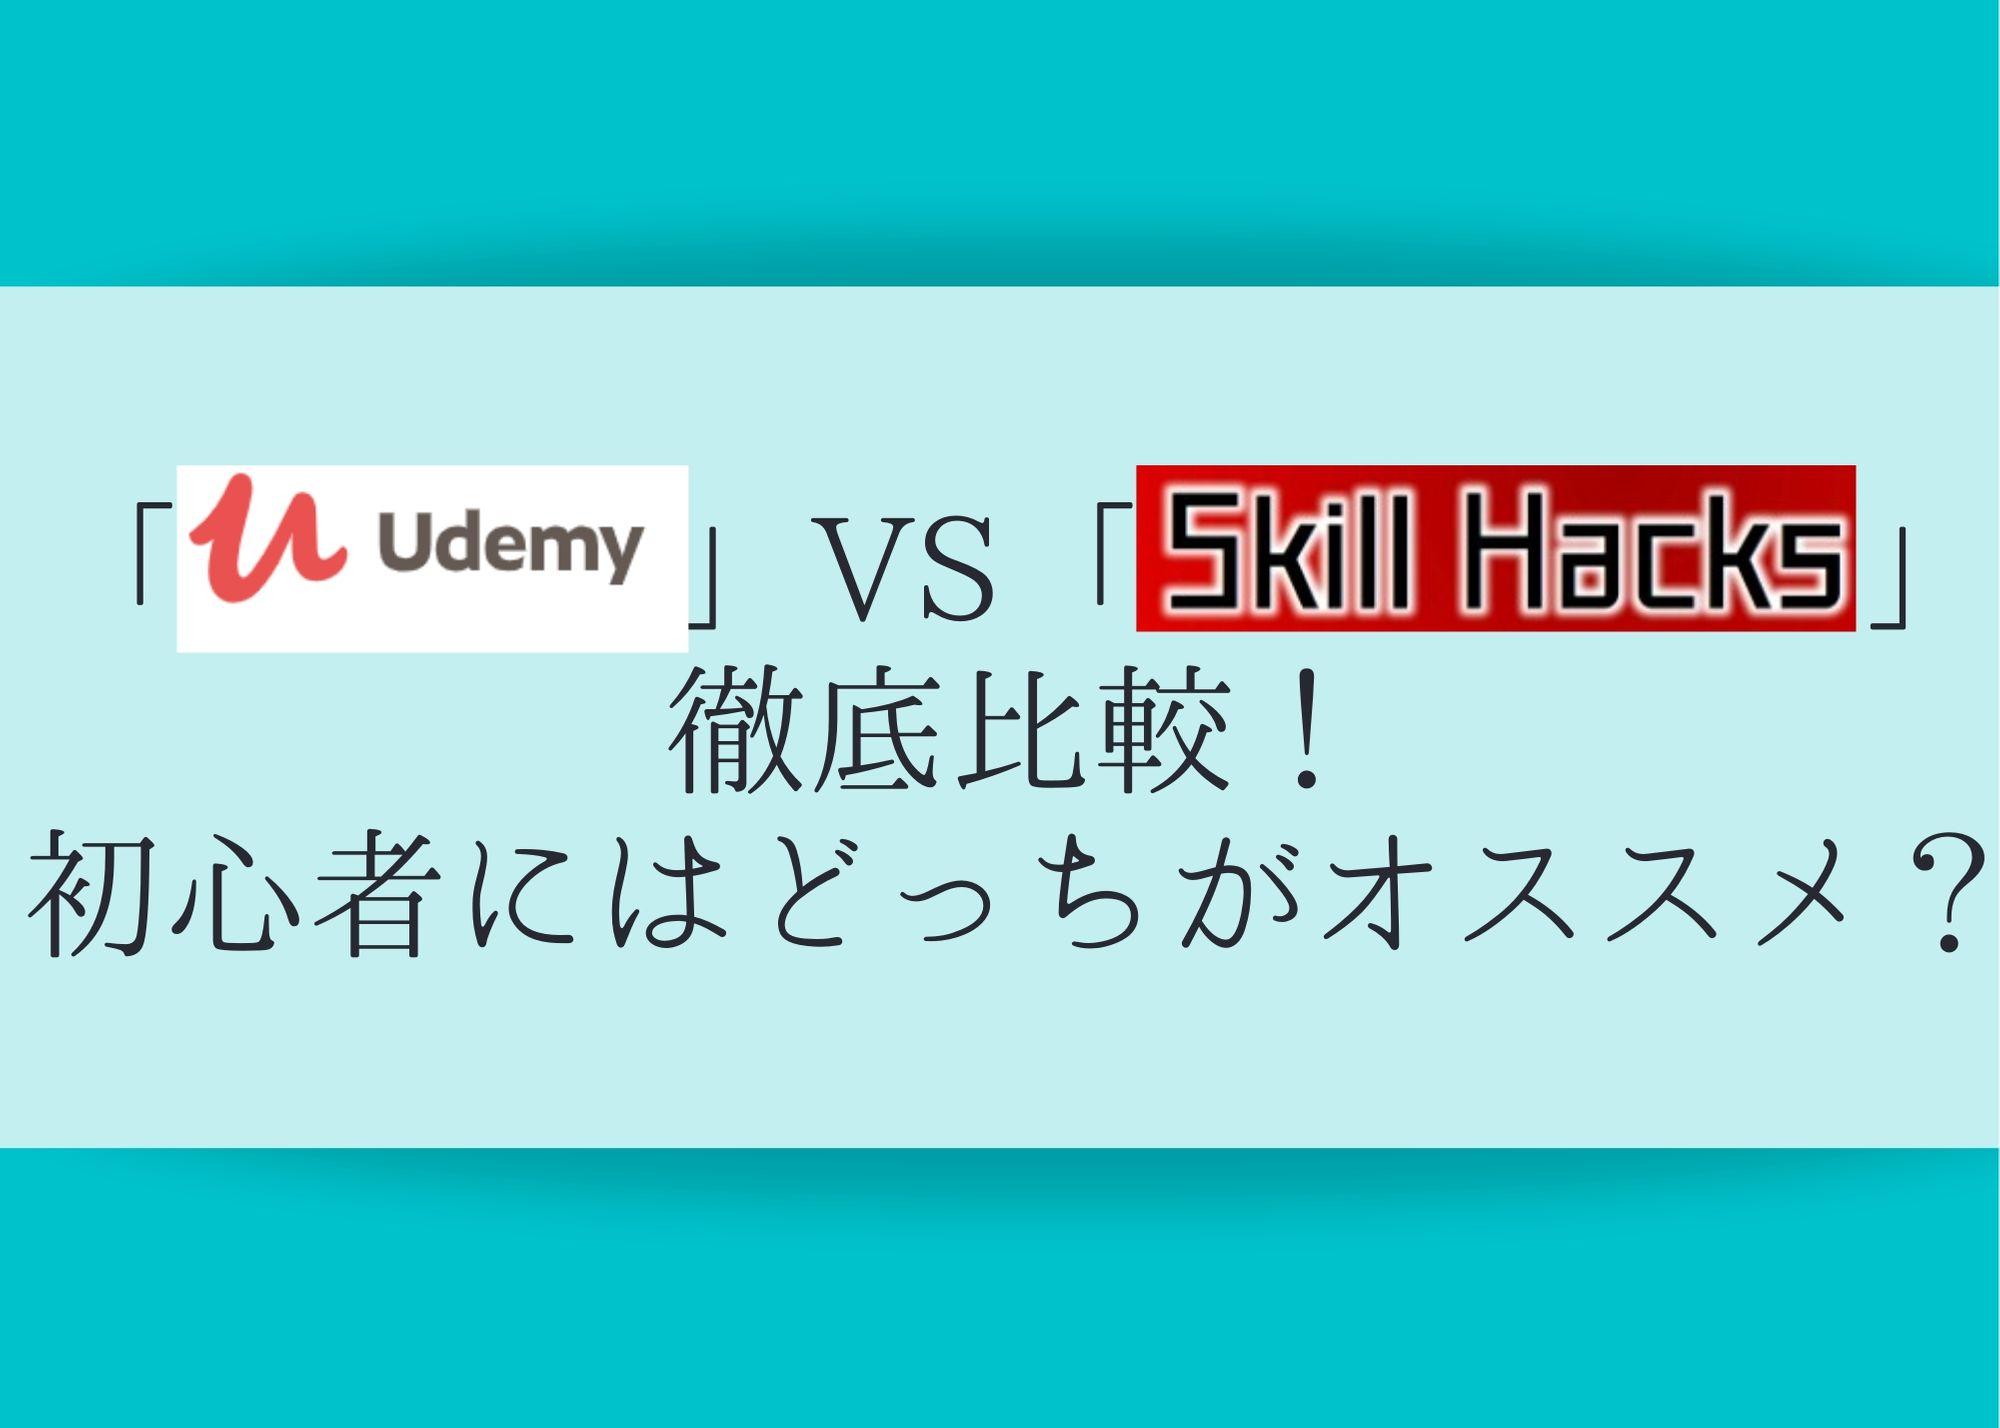 「Udemy」 VS 「SkillHacks」徹底比較!初心者にはどっちがオススメ?